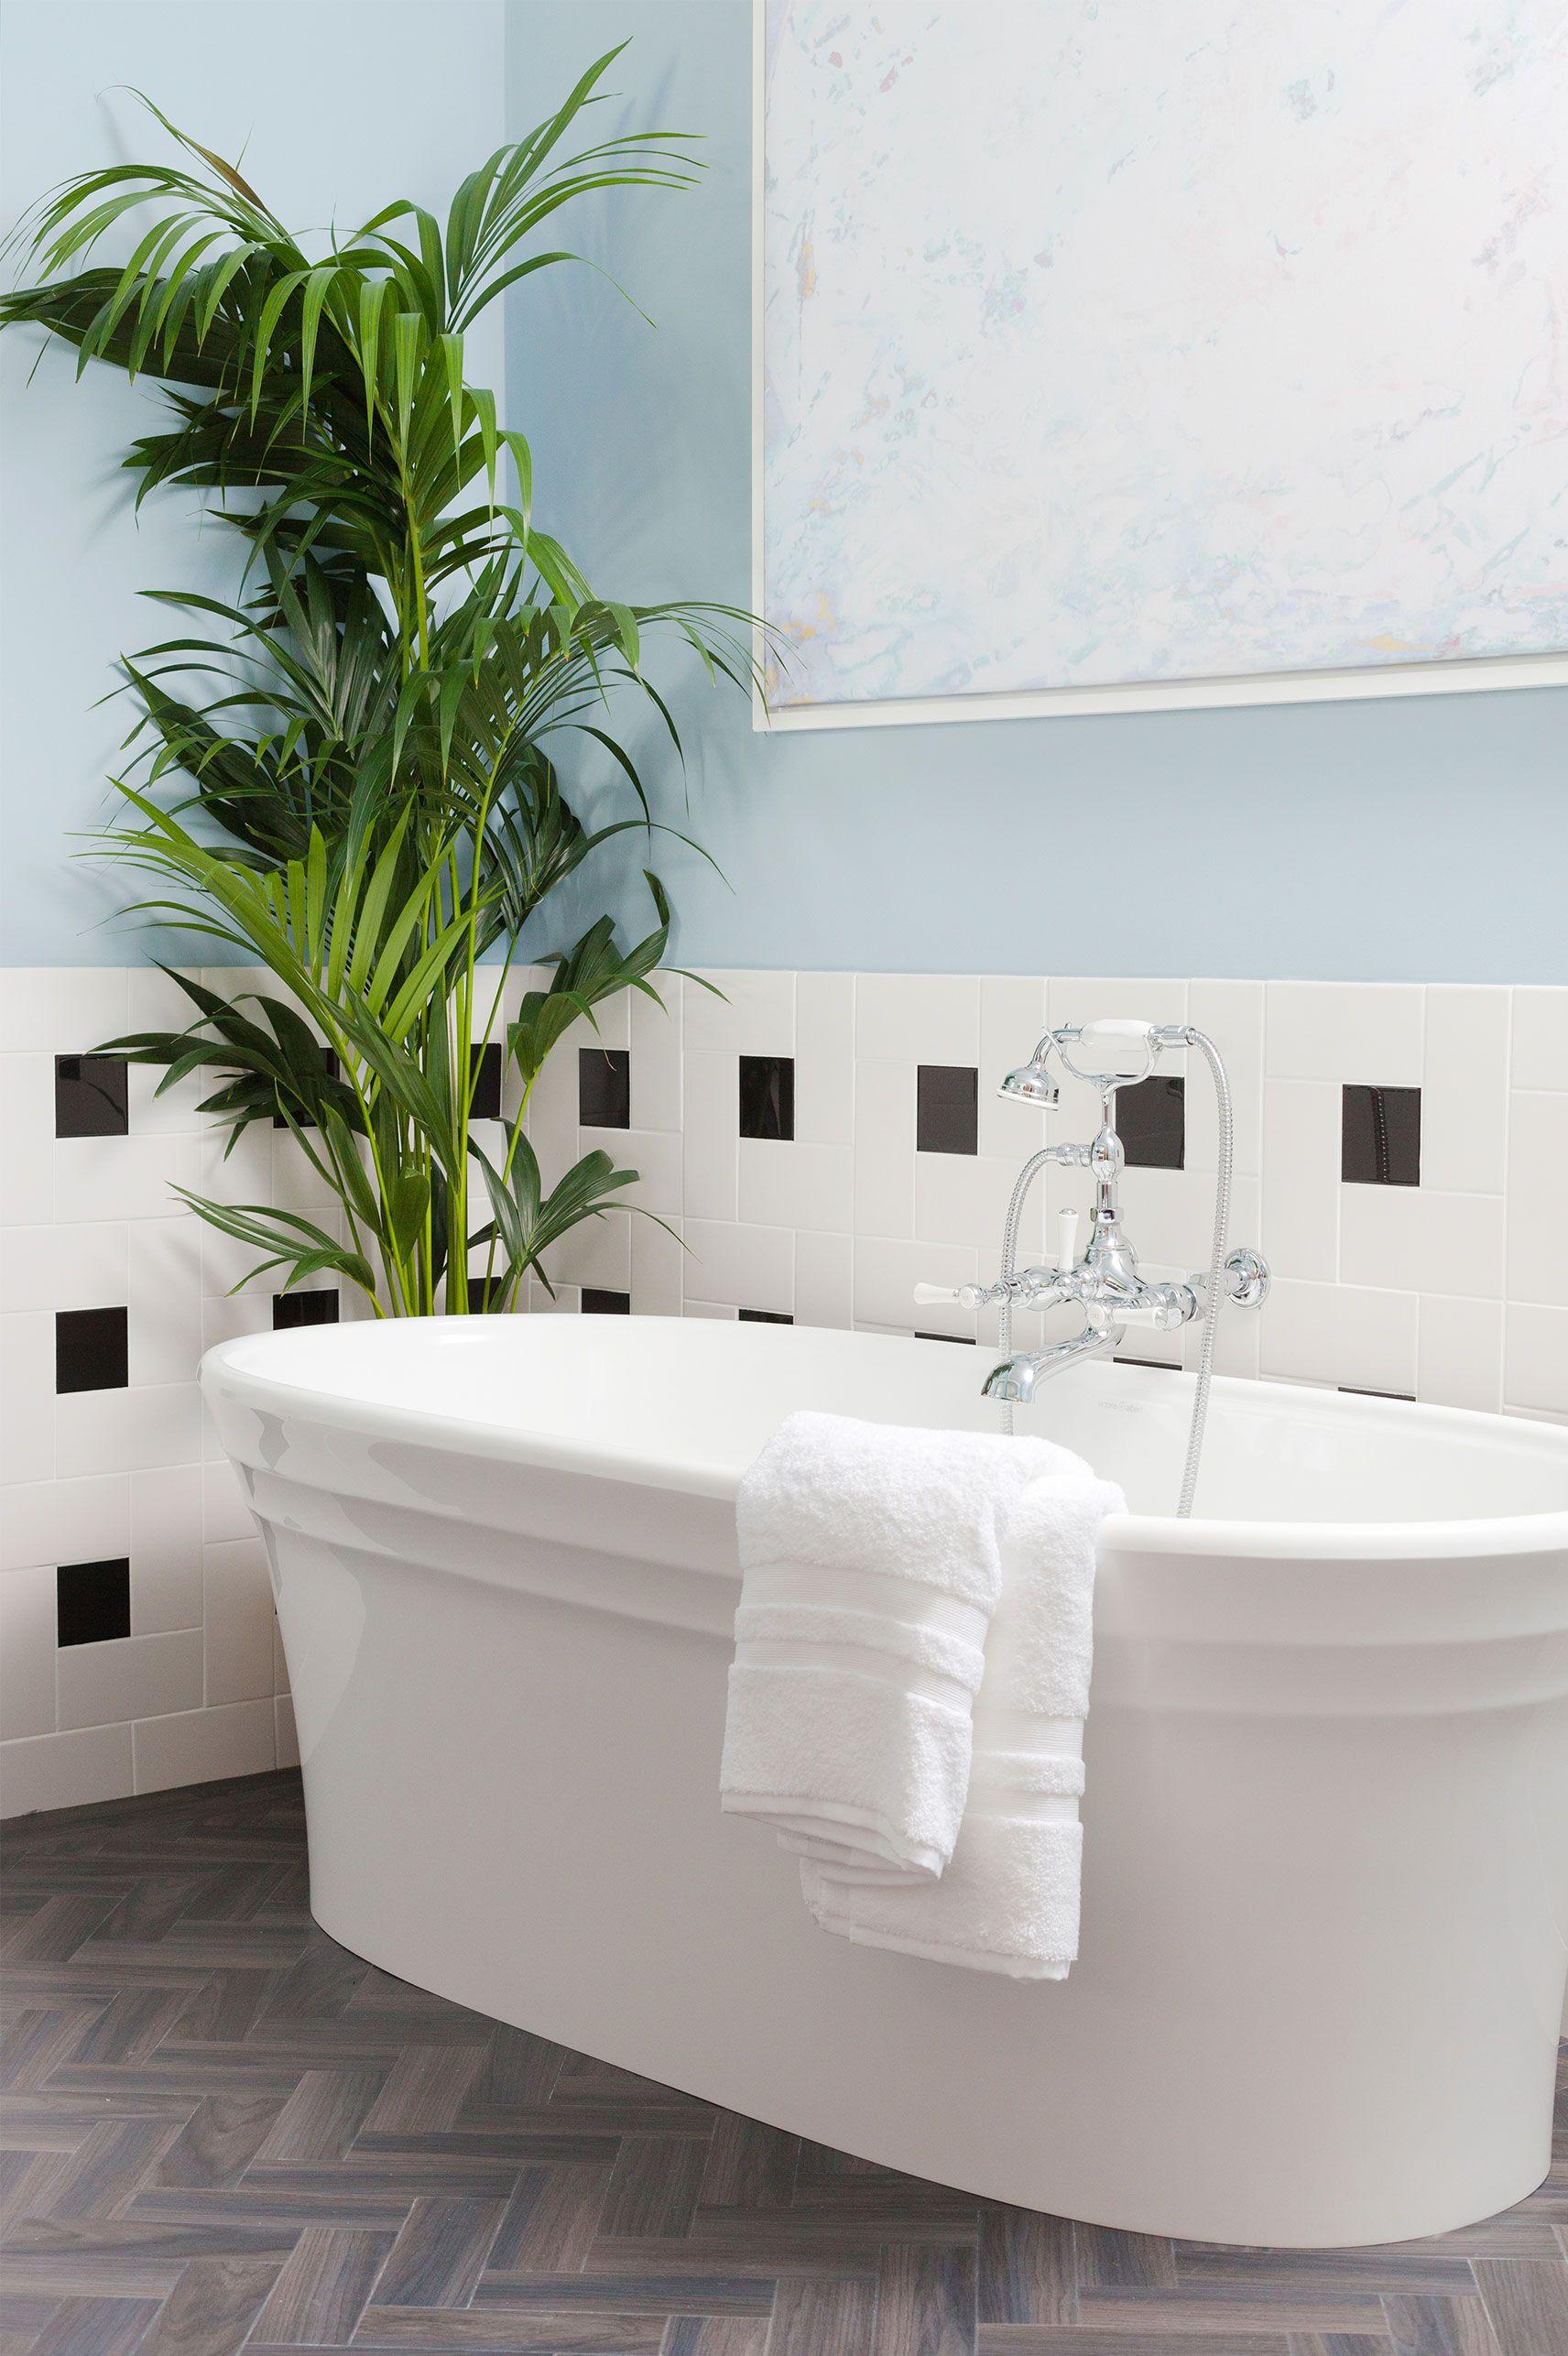 28 bathroom decorating ideas on a budget chic and affordable rh housebeautiful com bathroom decorating ideas on a budget pinterest apartment bathroom decorating ideas on a budget